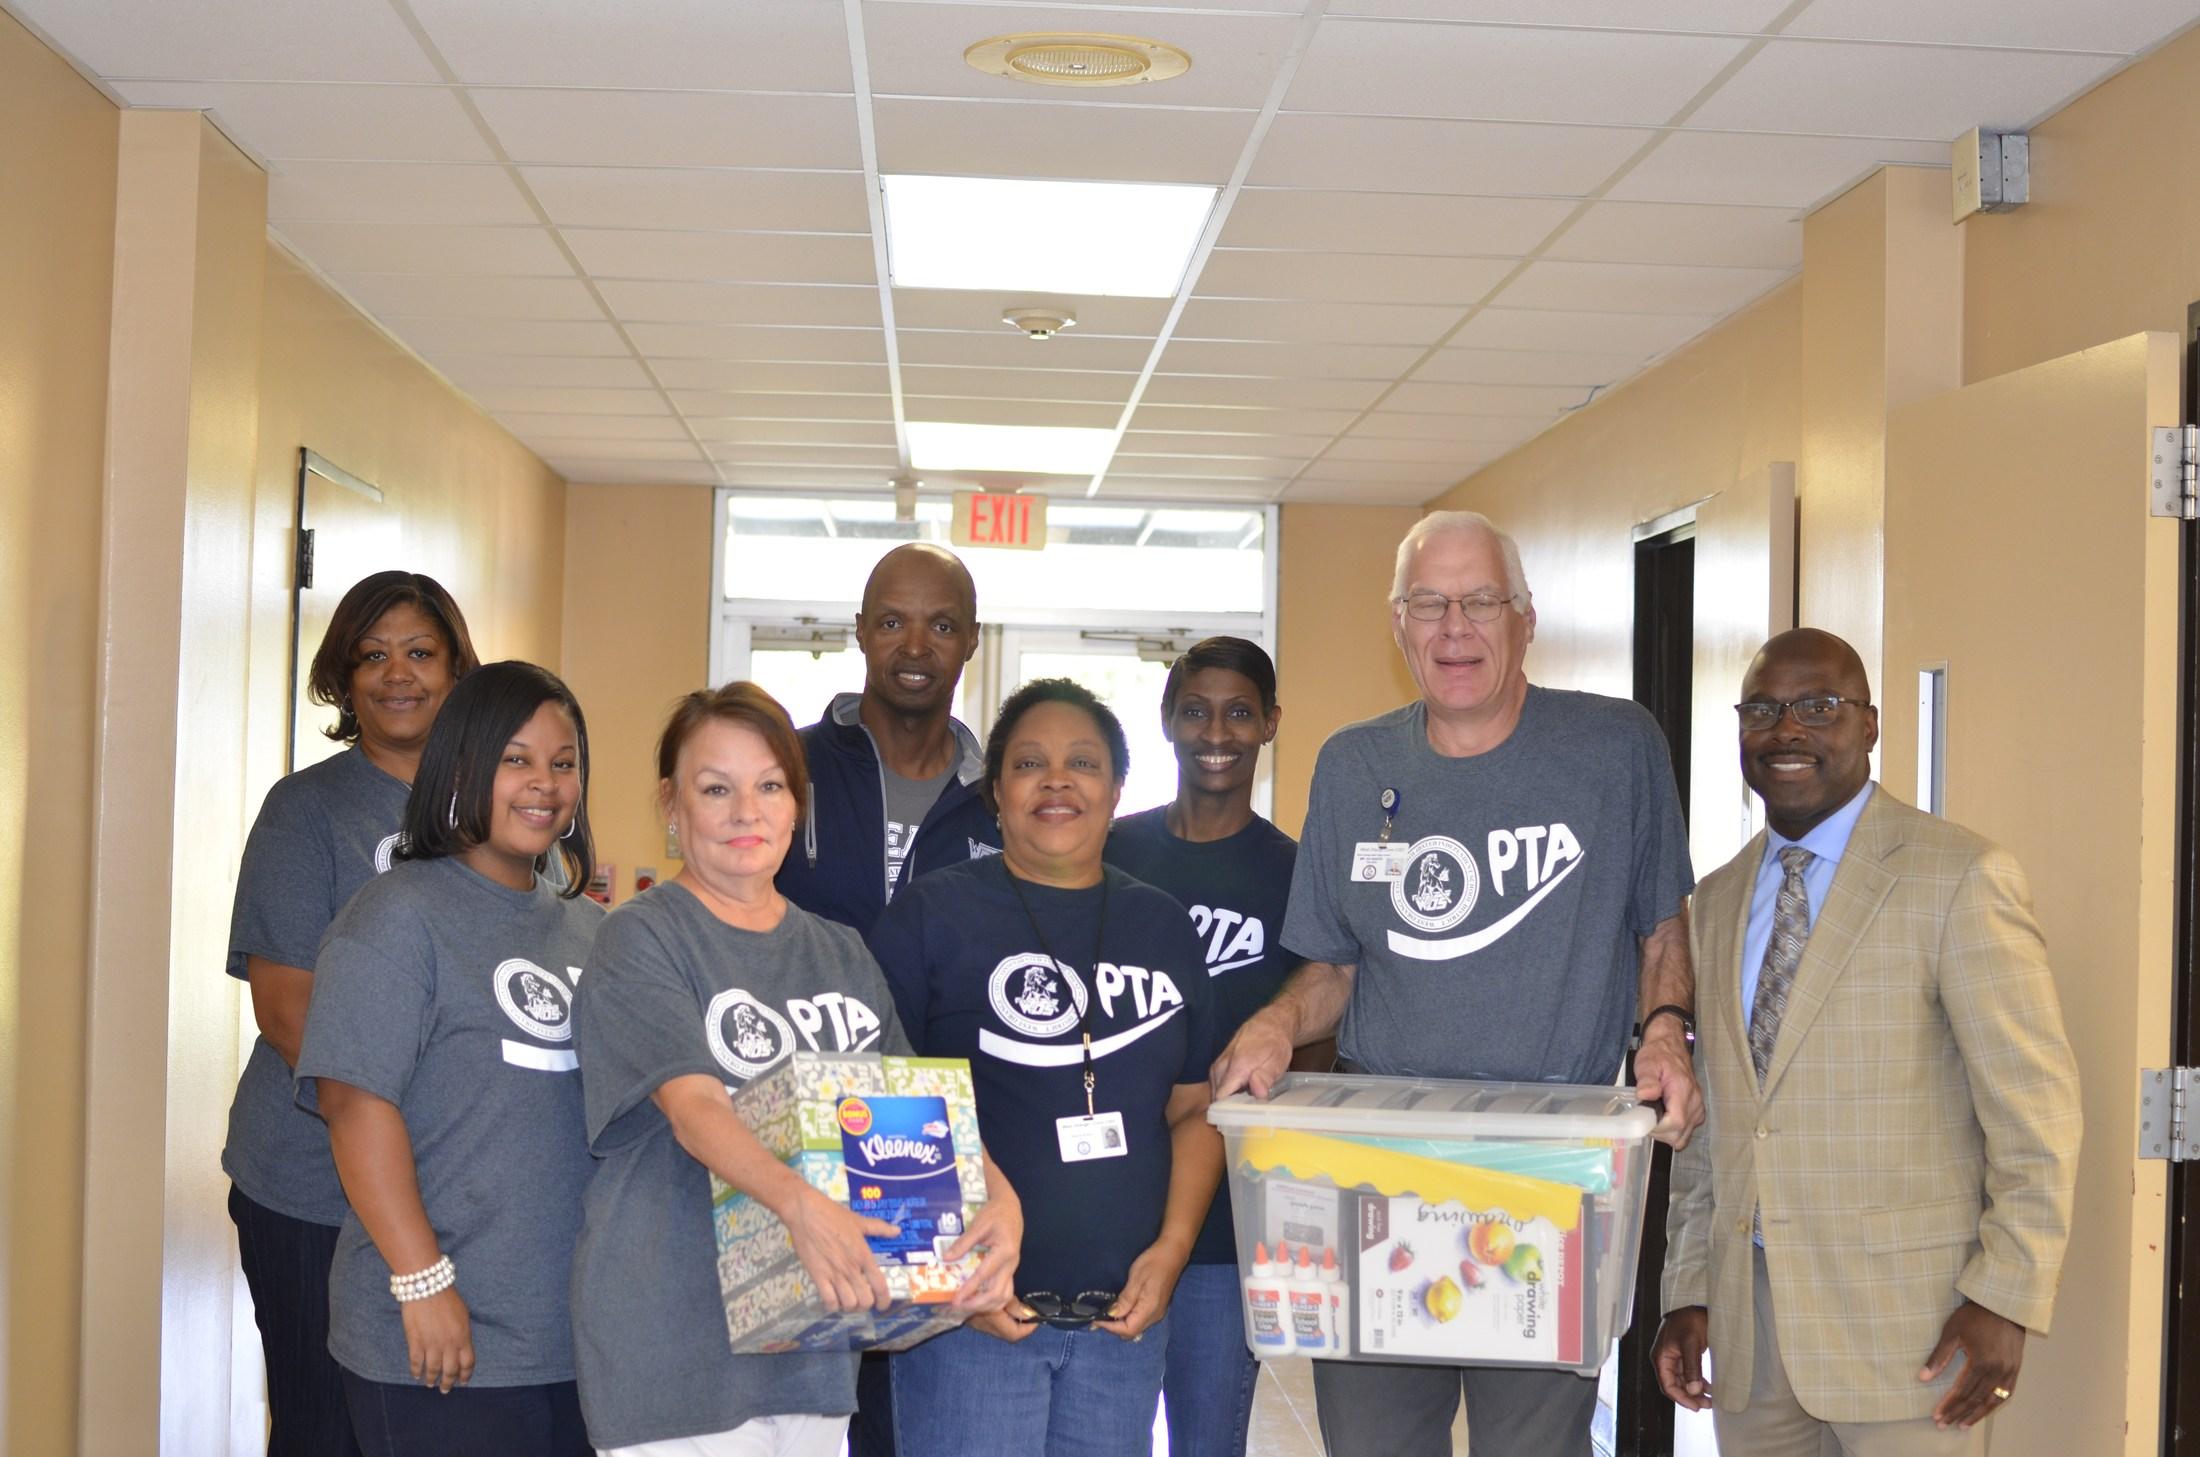 AAC staff along with Superintendent, Mr. Harris, and Parliamentarian, Linda Bryant, receiving PTA award.